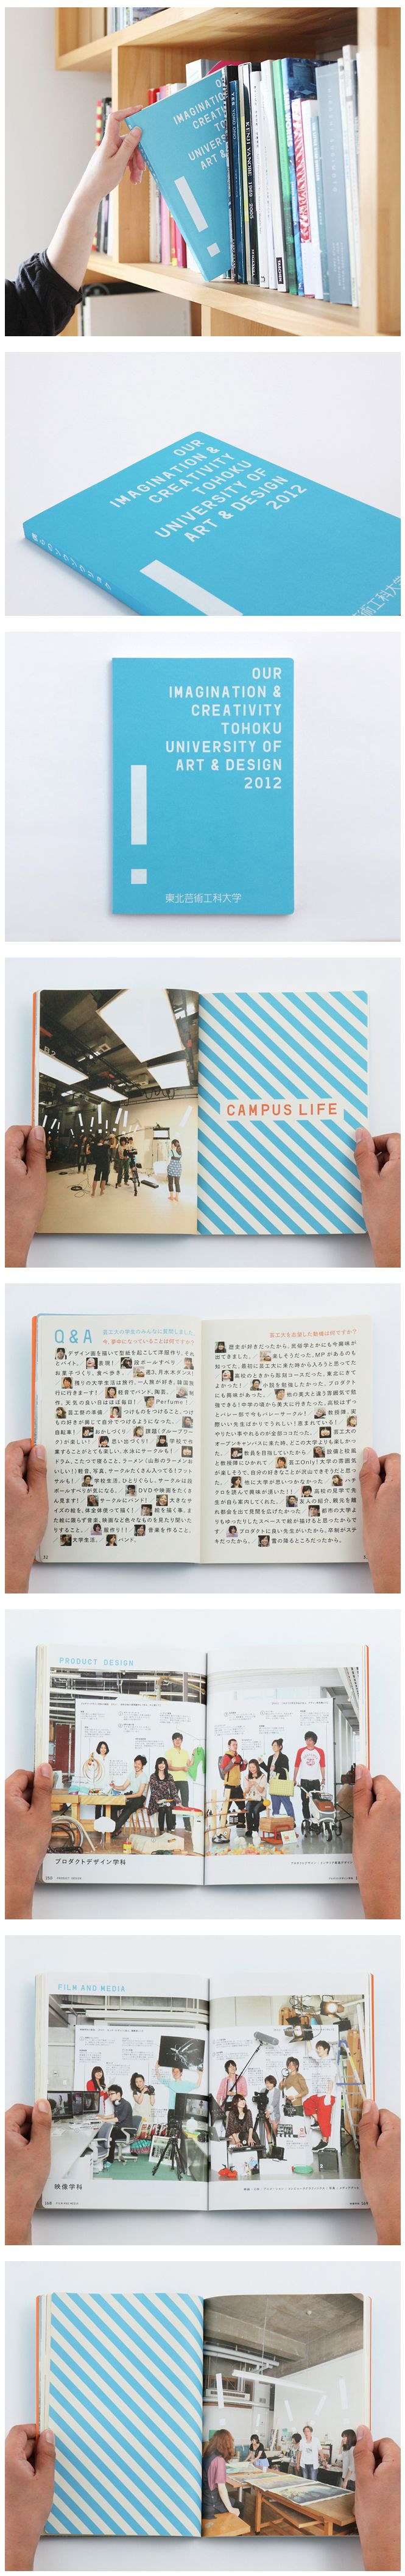 Client. TOHOKU UNIVERSITY OF ART & DESIGN Guide Book 2012 / Planning & Editorial Design 2011 Yamagata